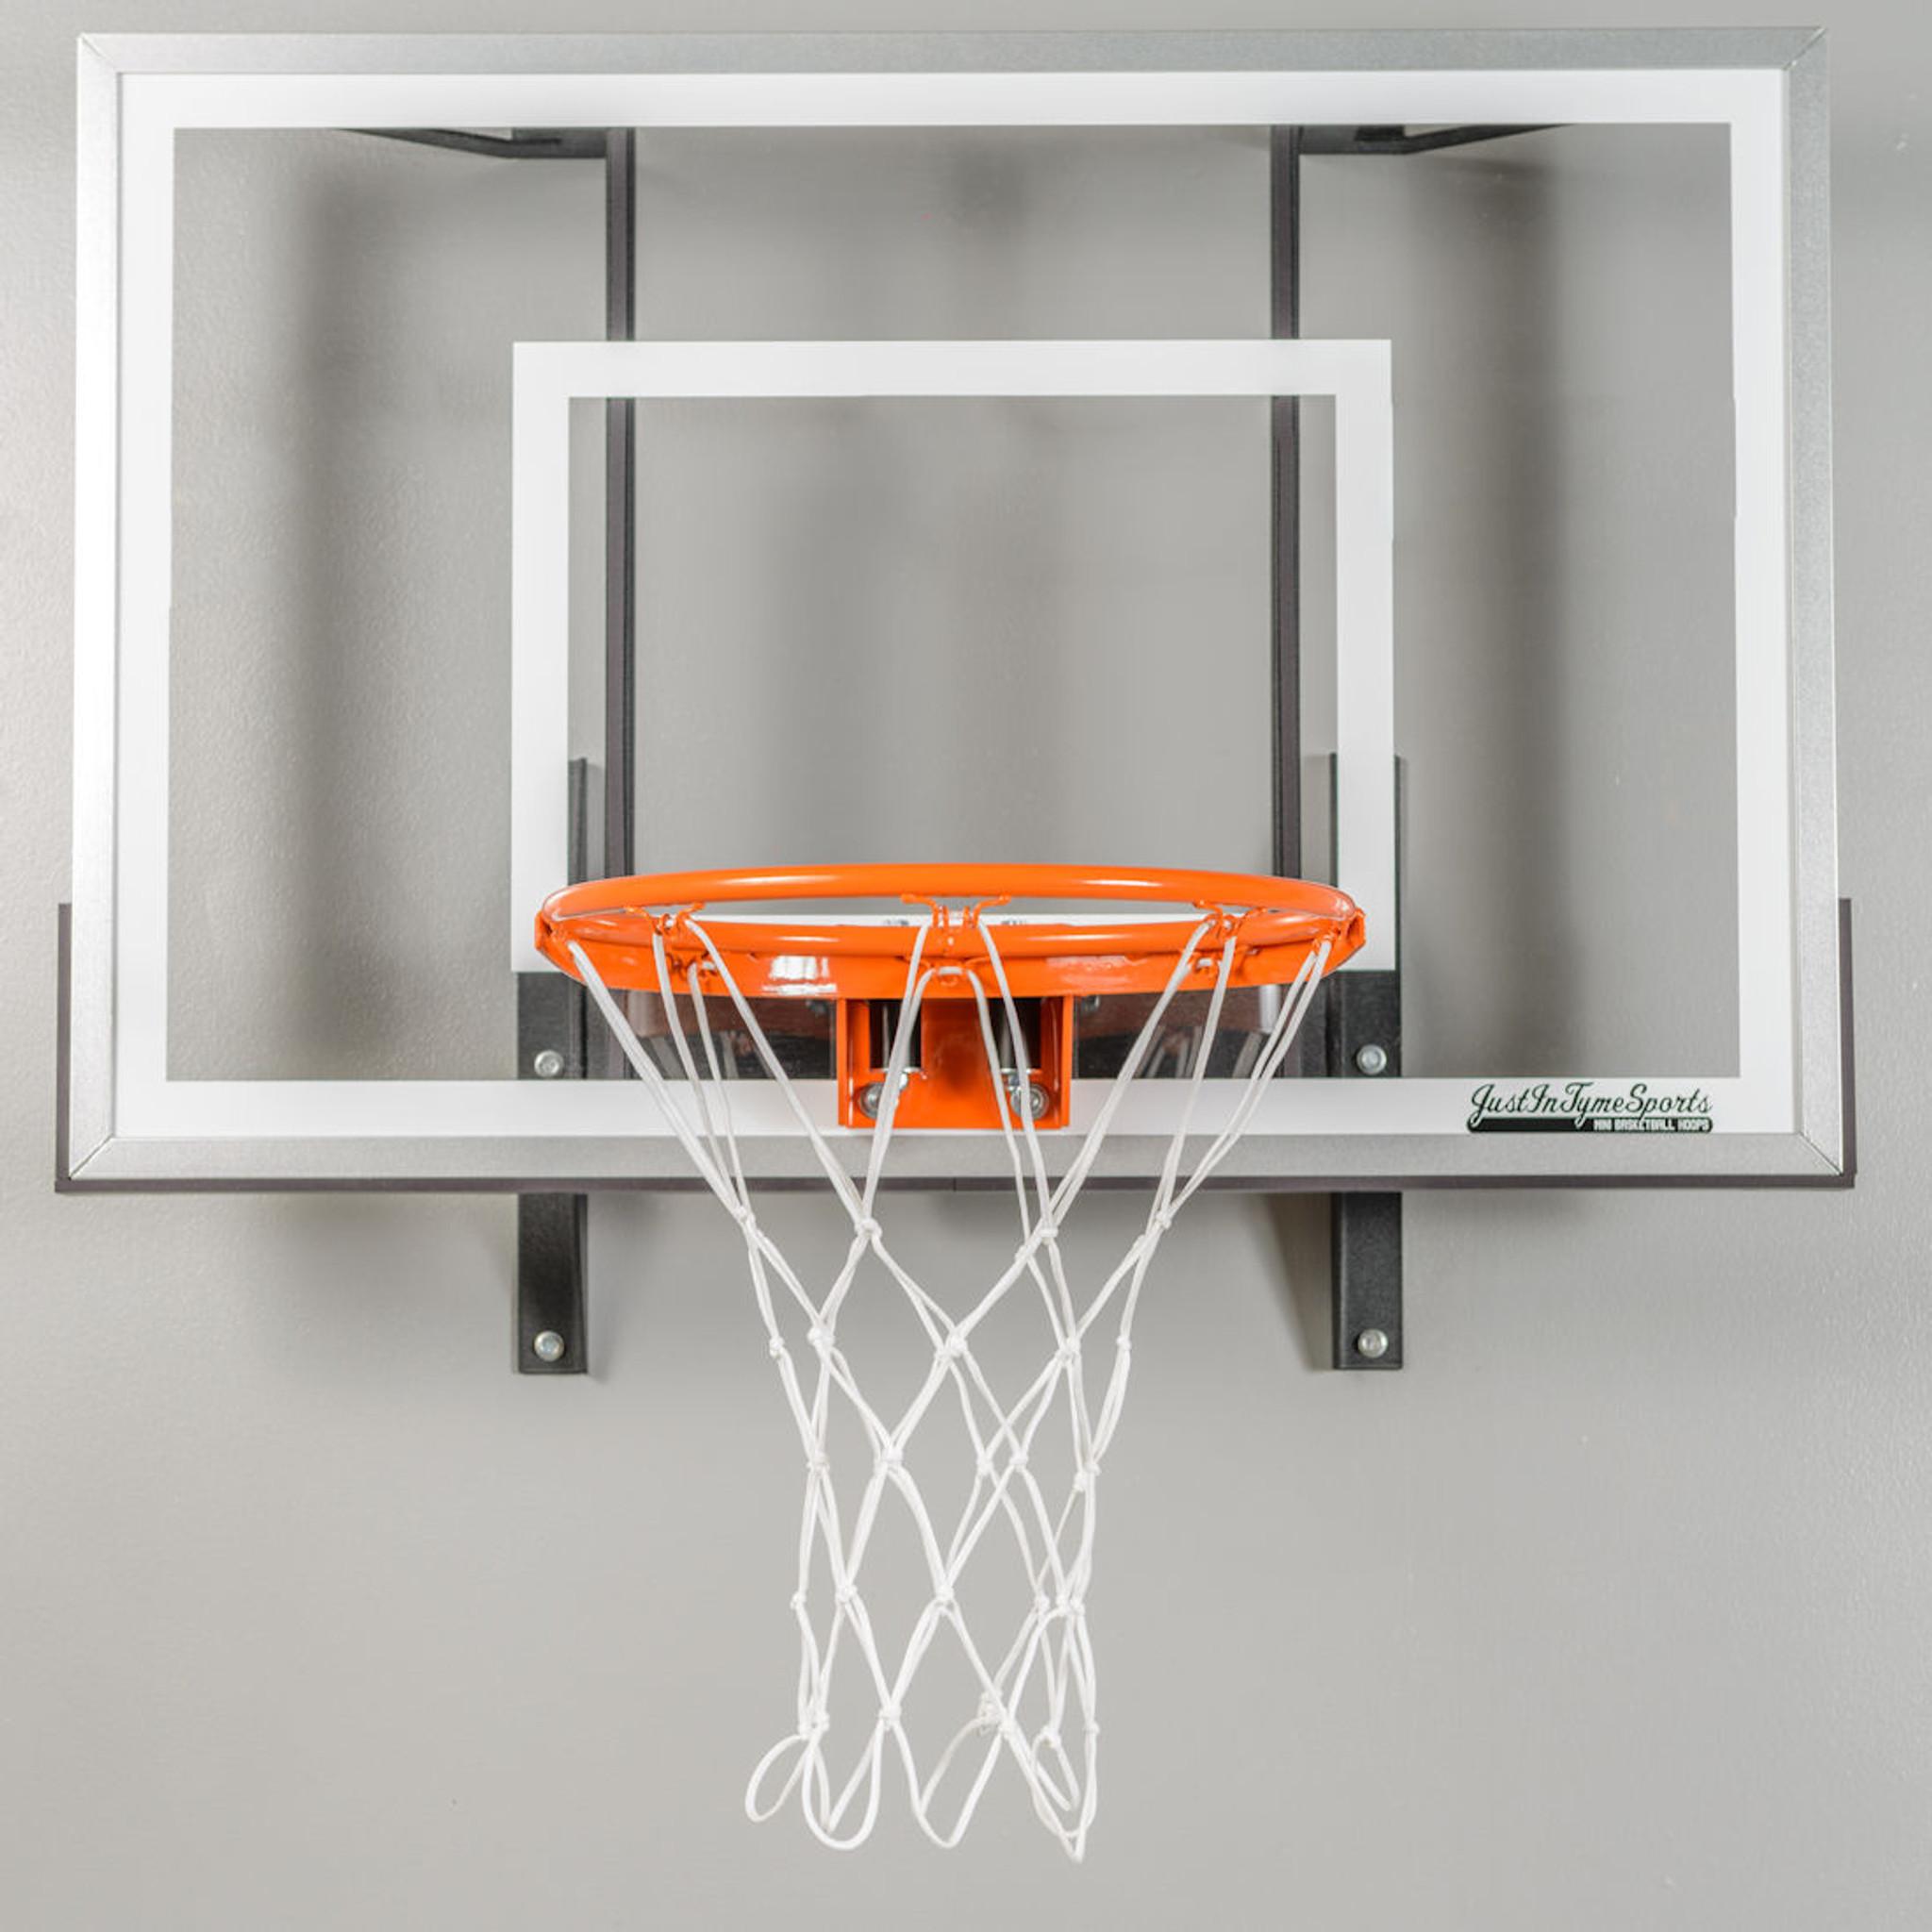 bedroom estate hoop for basketball at regarding minimalist of real photos